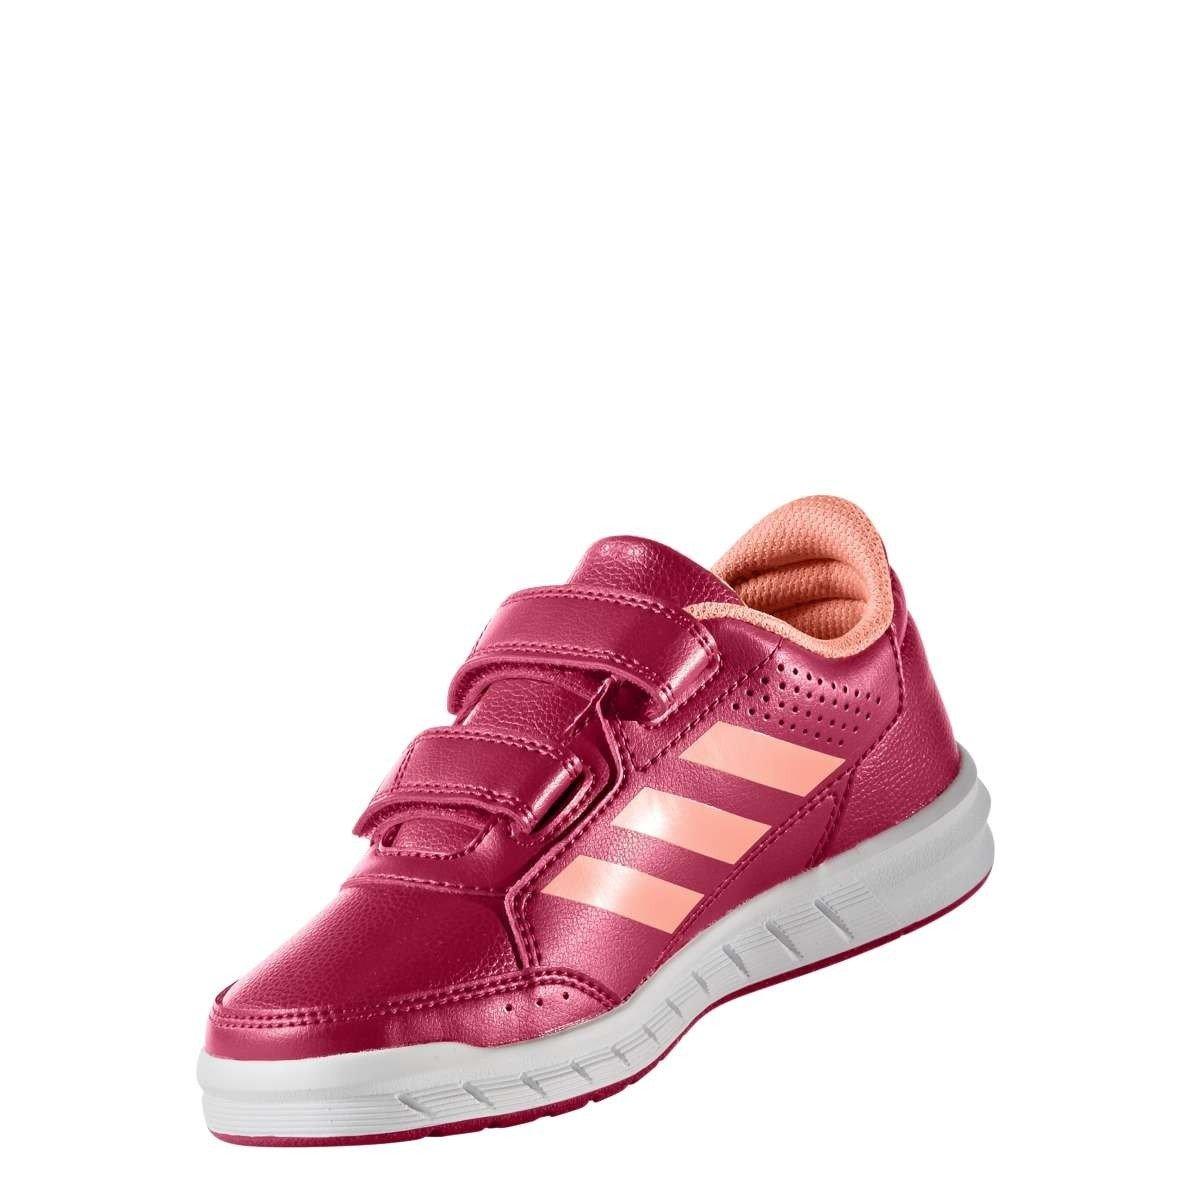 Adidas Altasport CF K, Zapatillas de Deporte Unisex Niñ os Zapatillas de Deporte Unisex niños Rosa (Rosene/Brisol/Ftwbla) 28 EU S81057